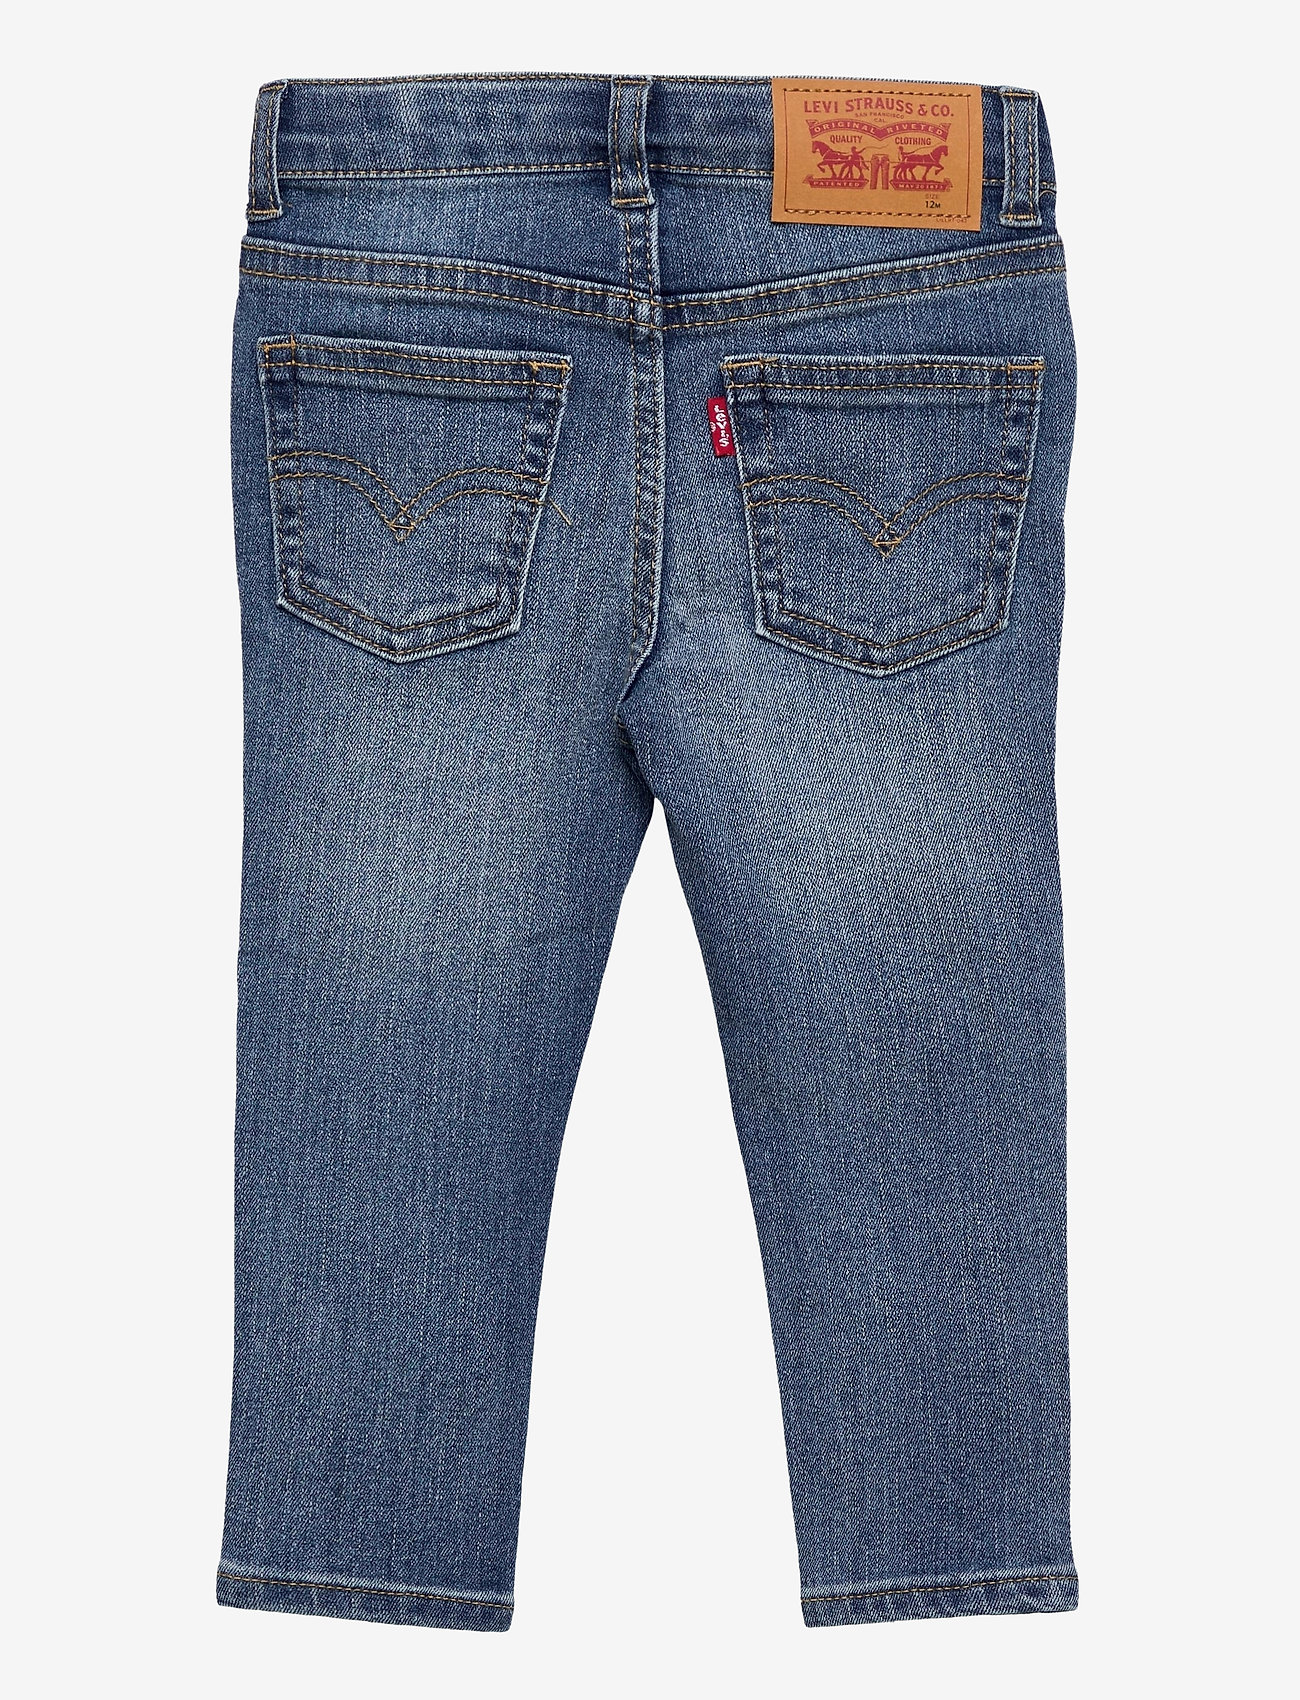 Levi's - SKINNY DENIM JEANS - jeans - milestone - 1